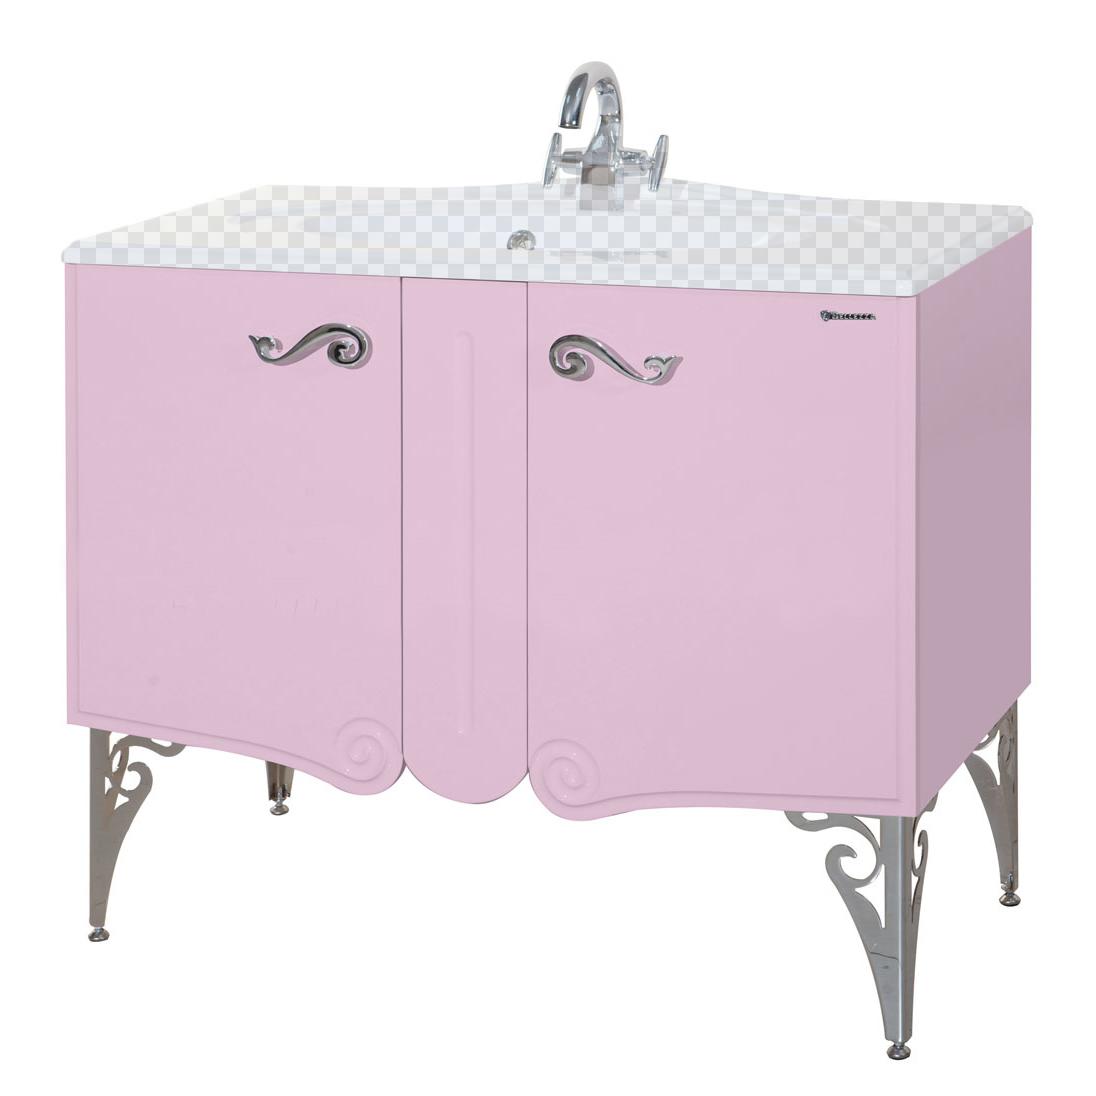 Тумба под раковину Bellezza Эстель 80 розовый босоножки quelle heine 182970